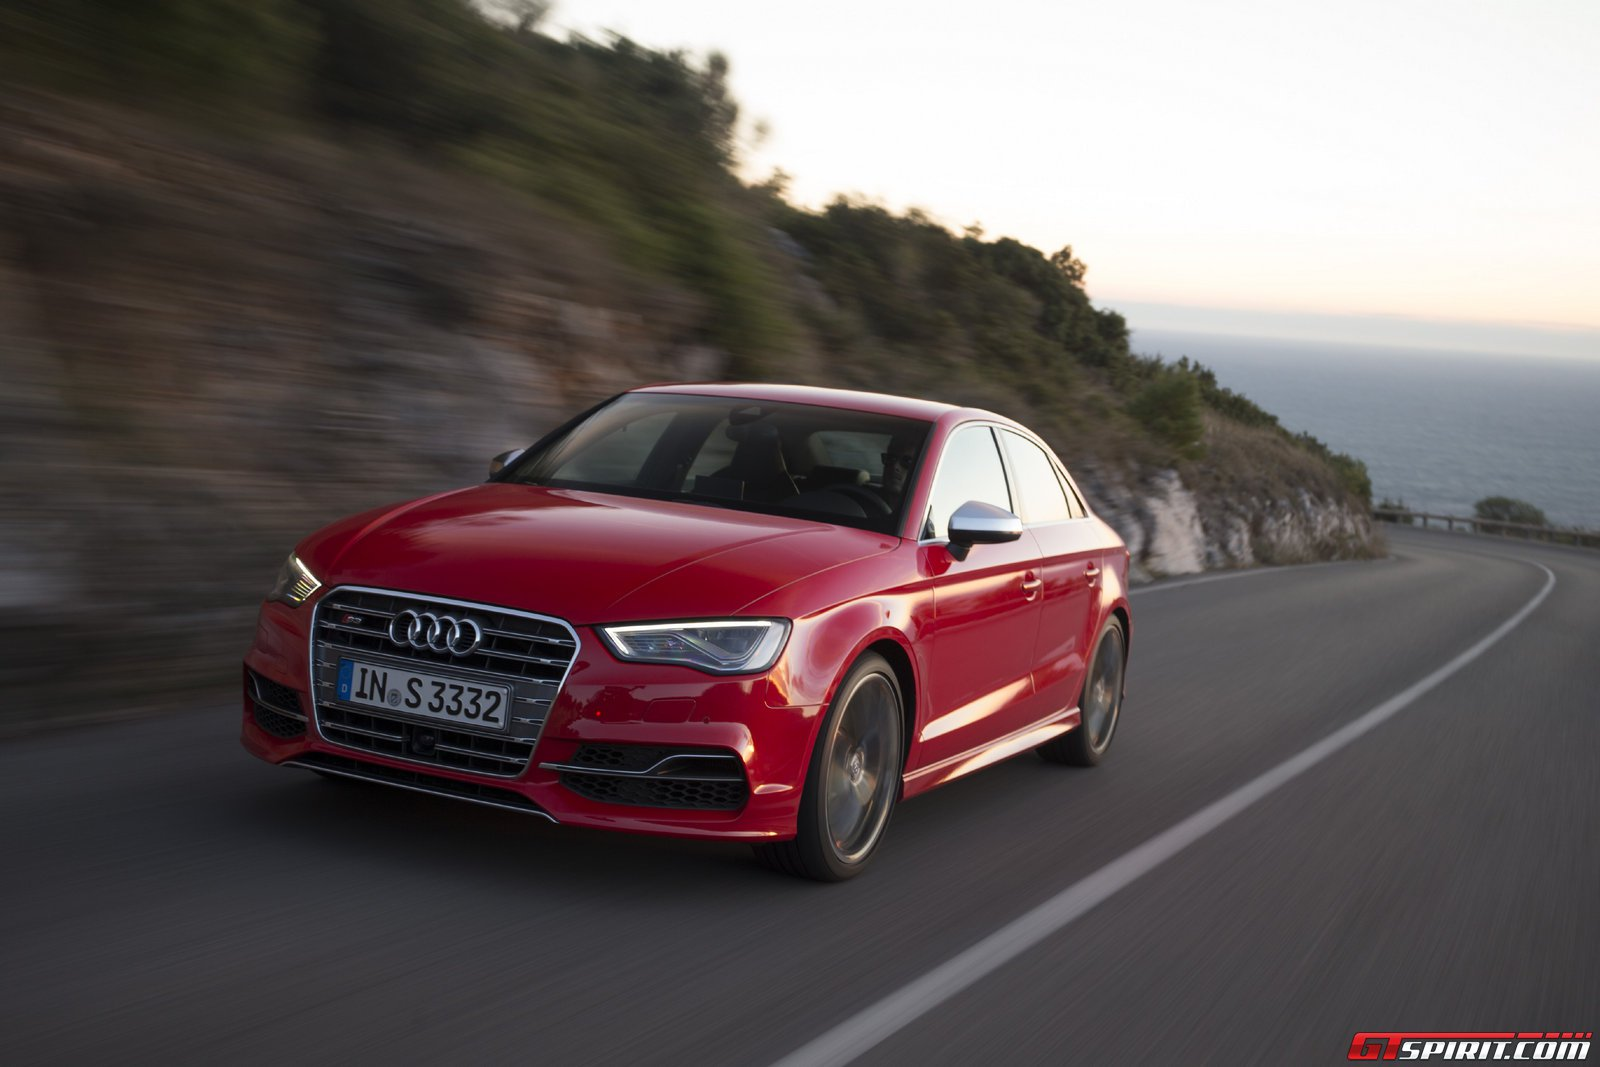 Kelebihan Audi S3 2014 Murah Berkualitas